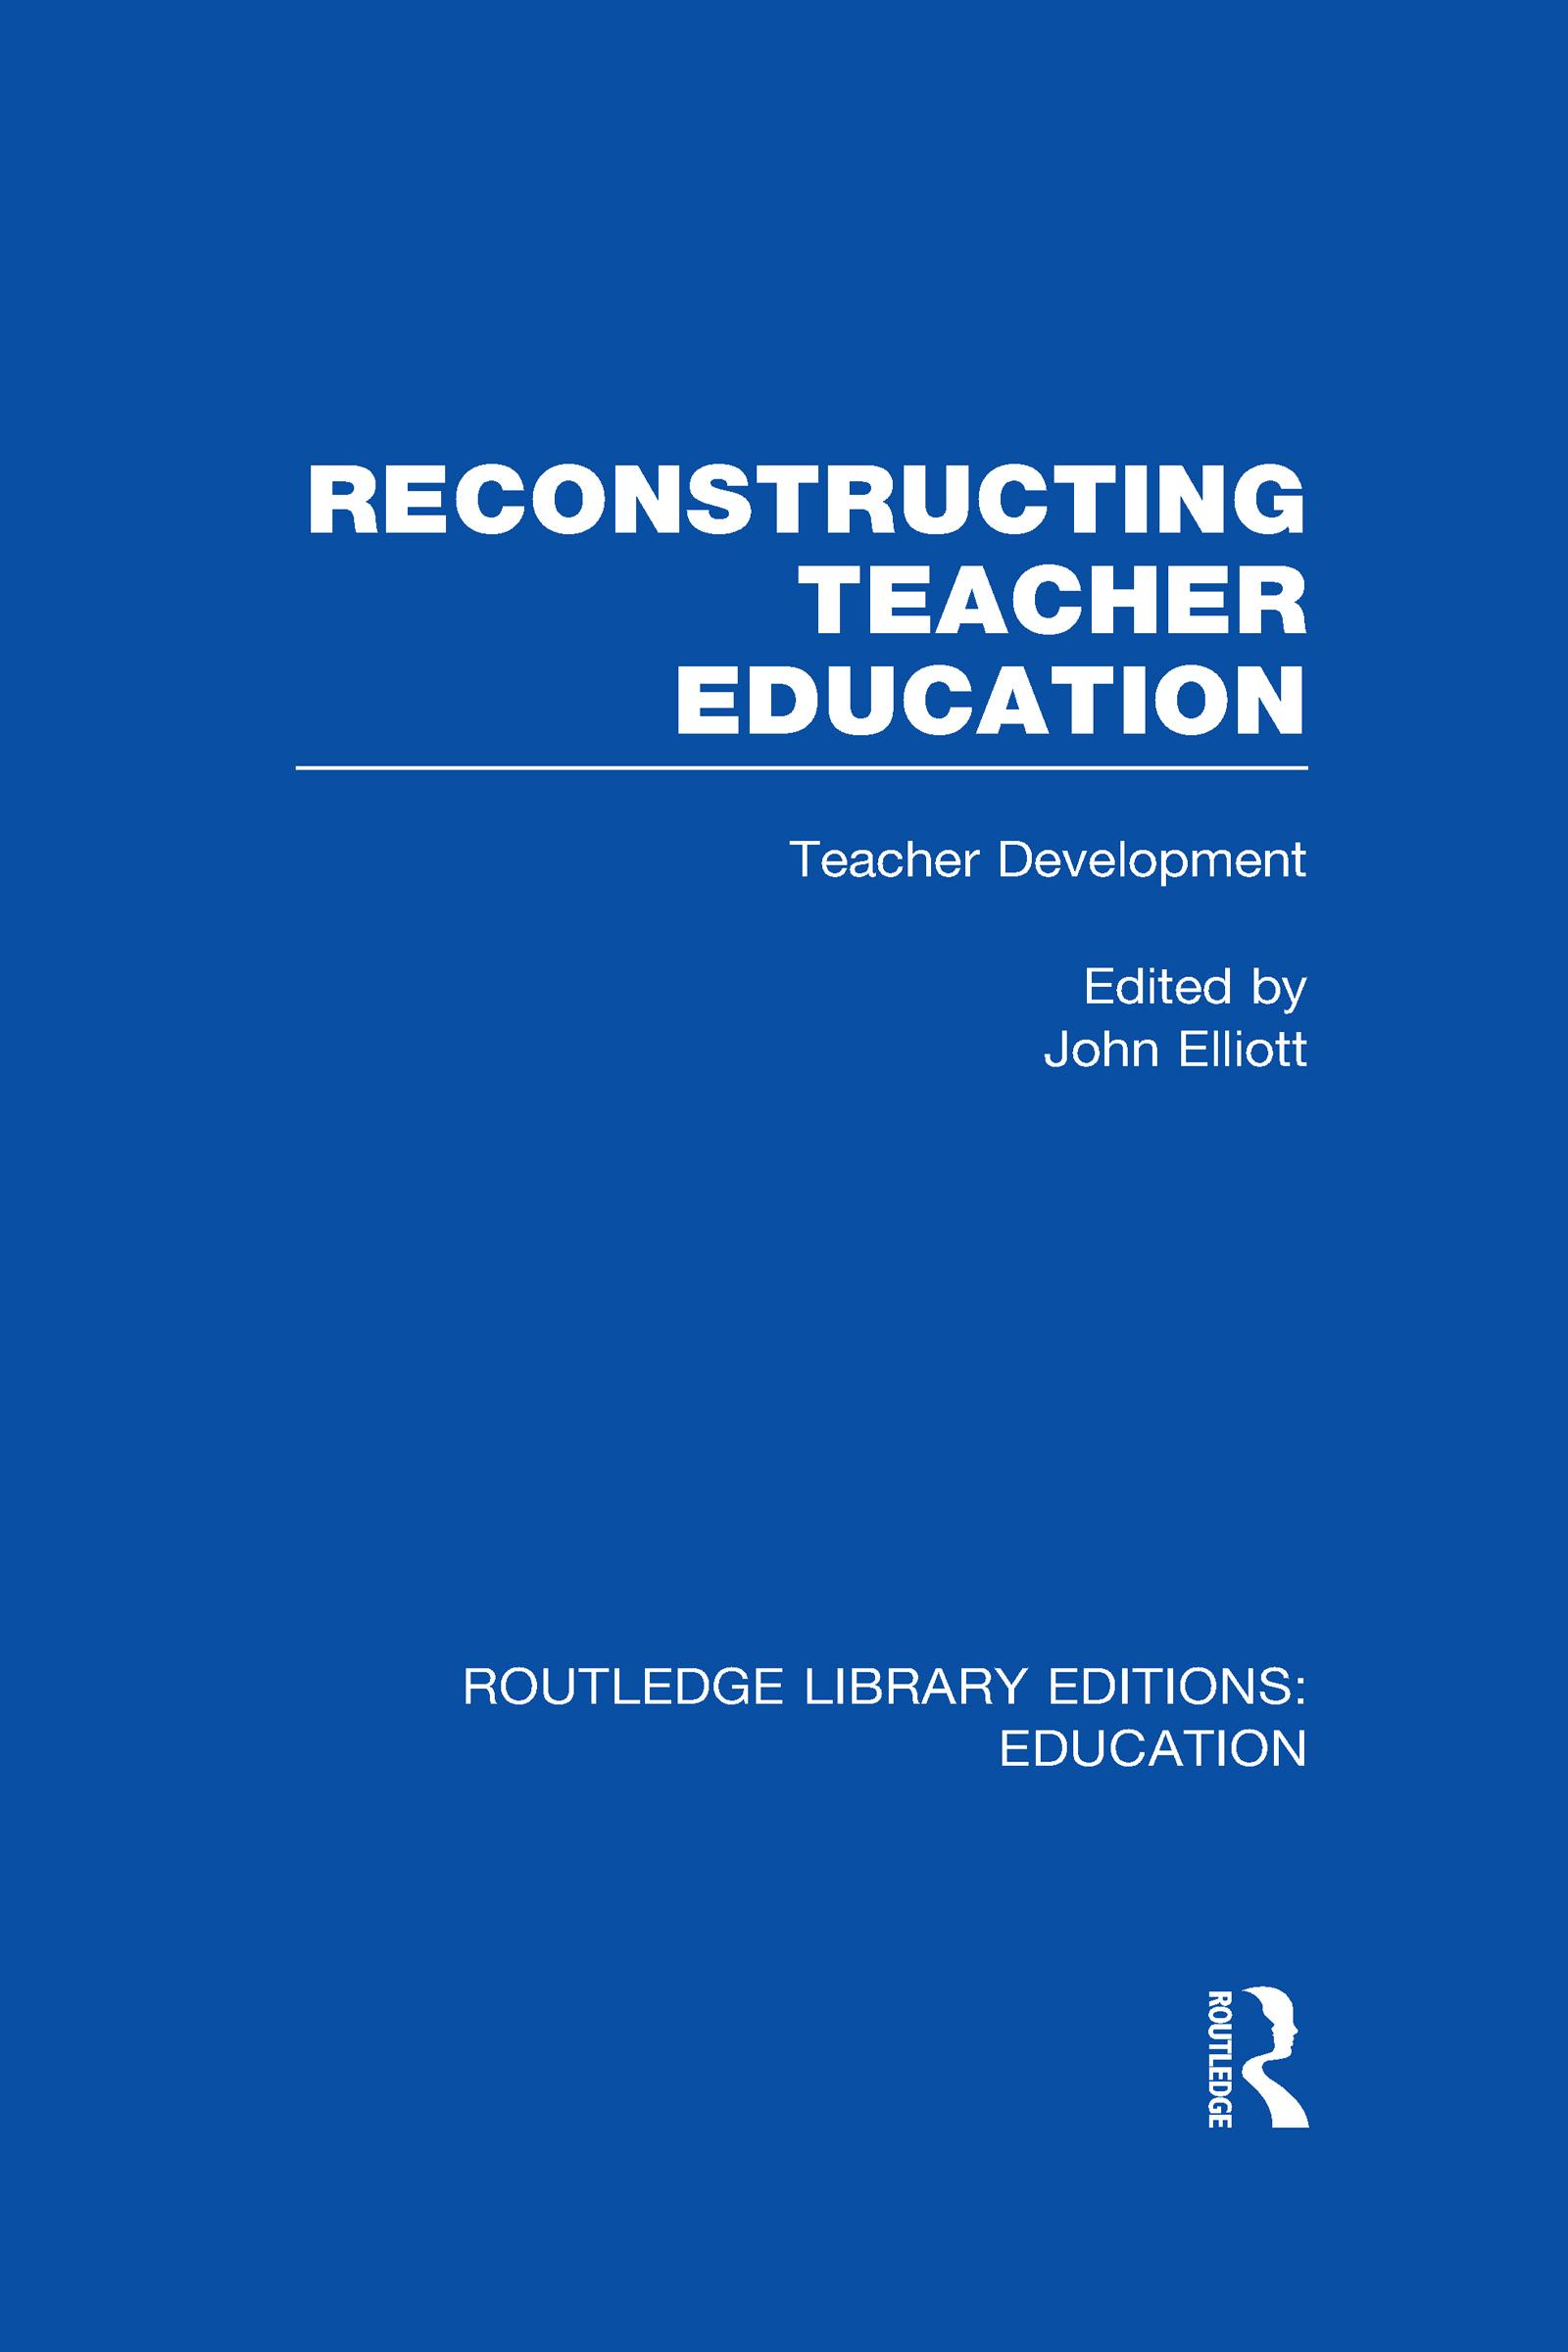 Reconstructing Teacher Education (RLE Edu N) (Hardback) book cover